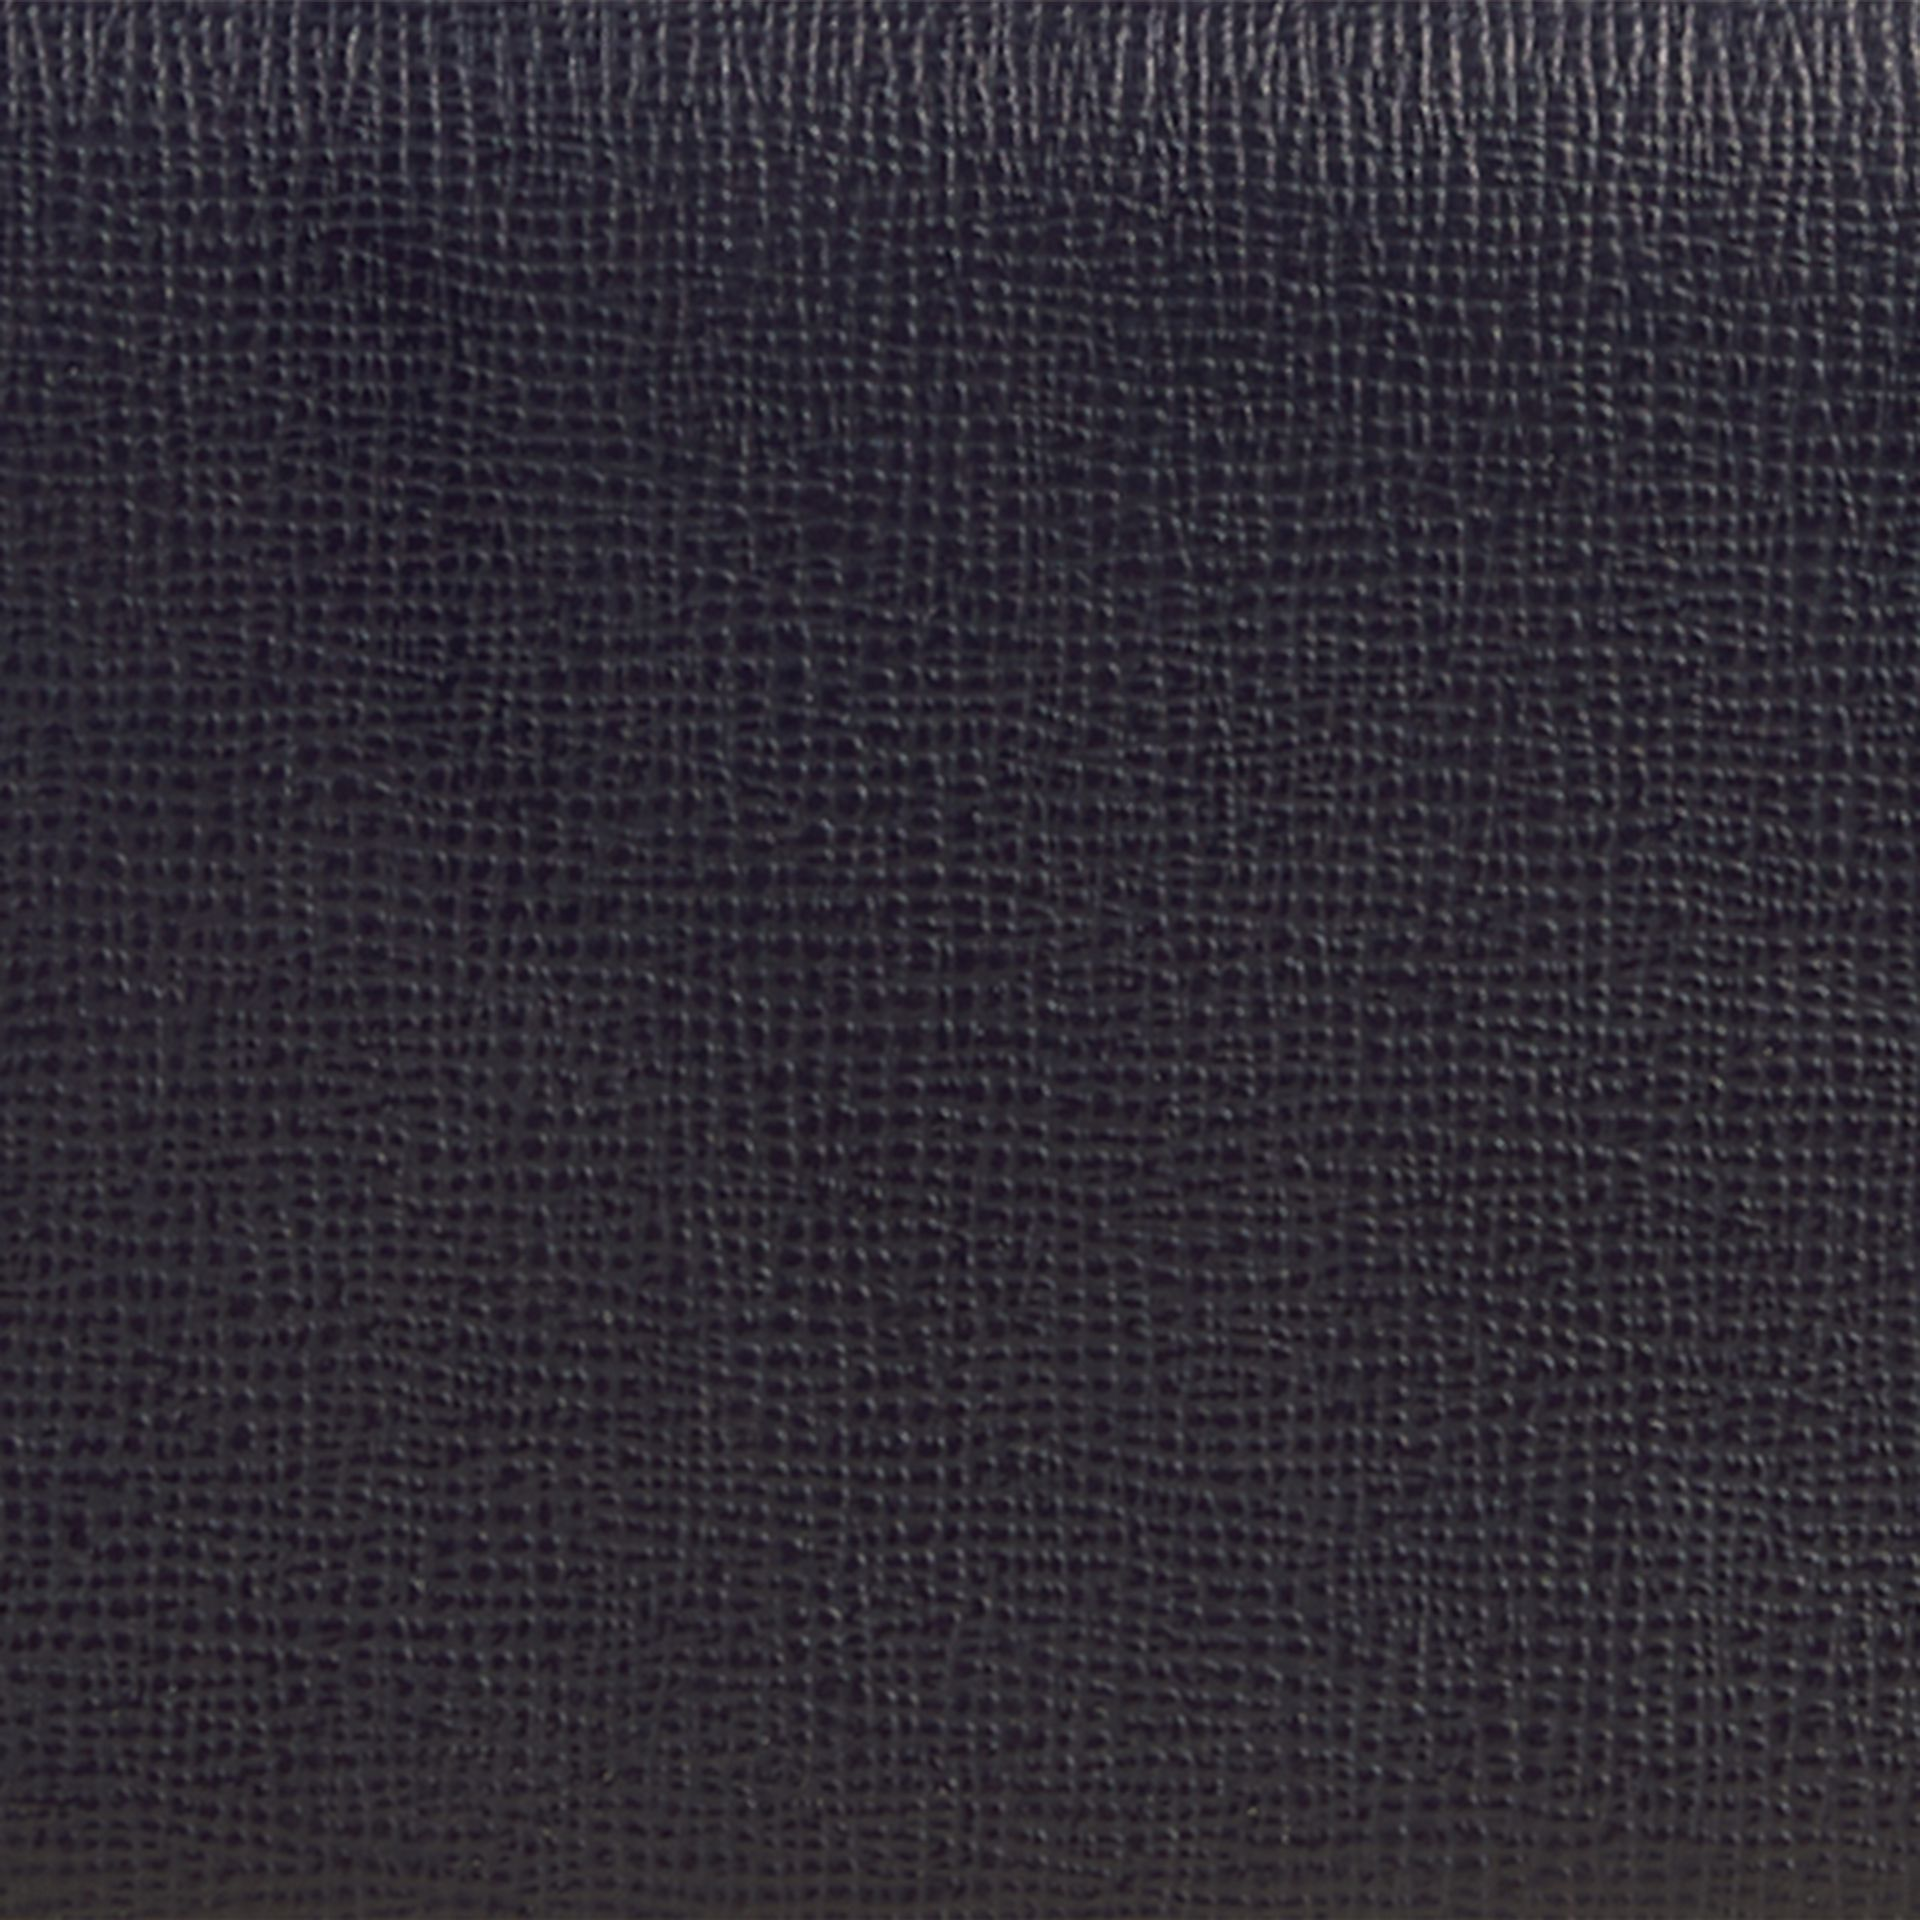 Dark navy London Leather Continental Wallet Dark Navy - gallery image 2